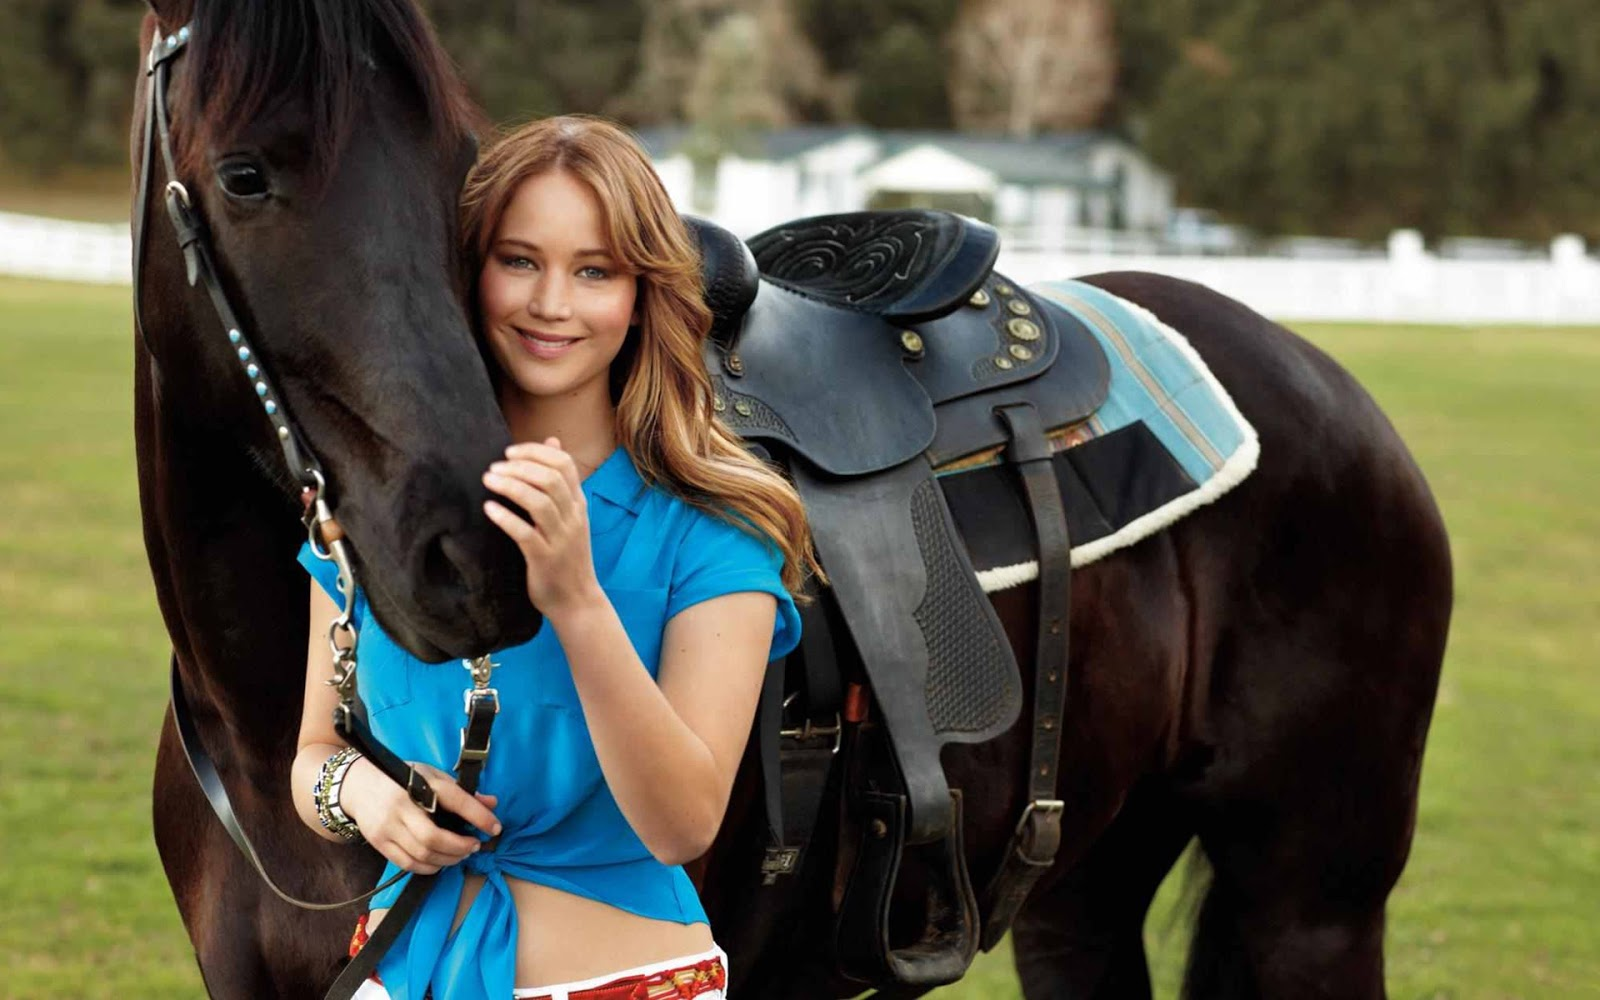 Jennifer Lawrence Hot Hd Photos  Wallpaper - Hd Images -9135